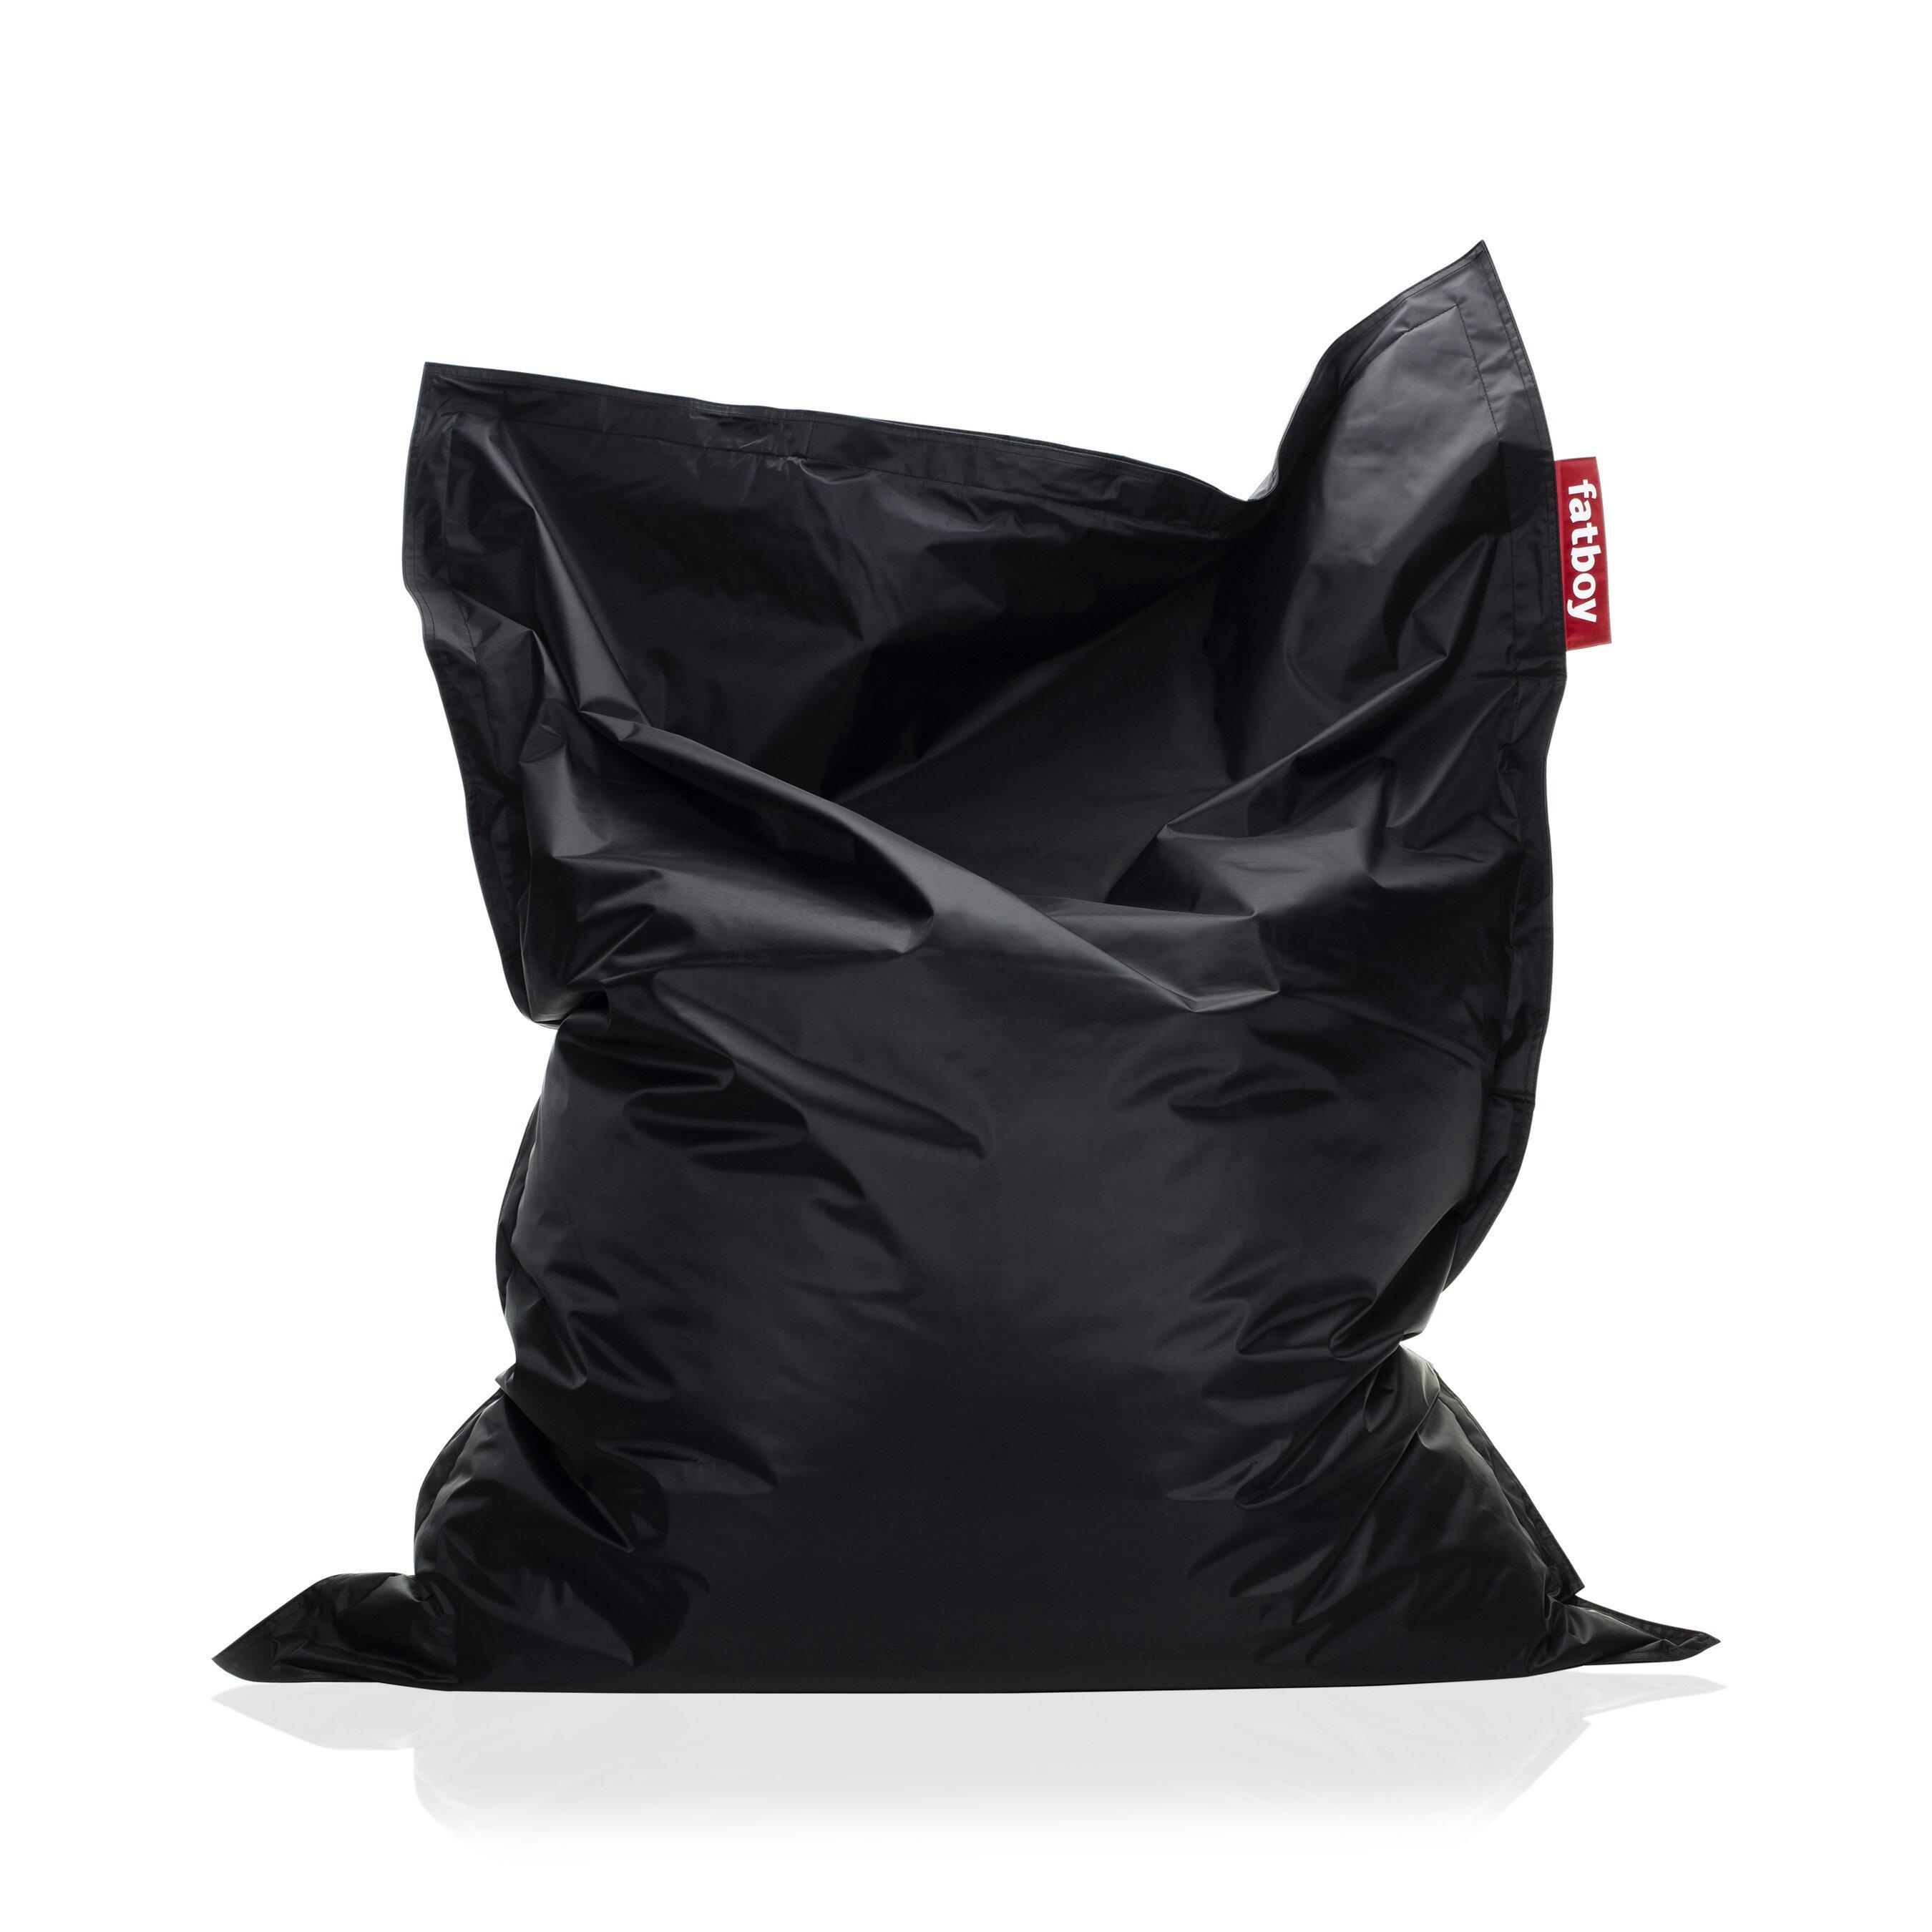 original les fatboy furniture qatar equipment tm product solutions lifestyle